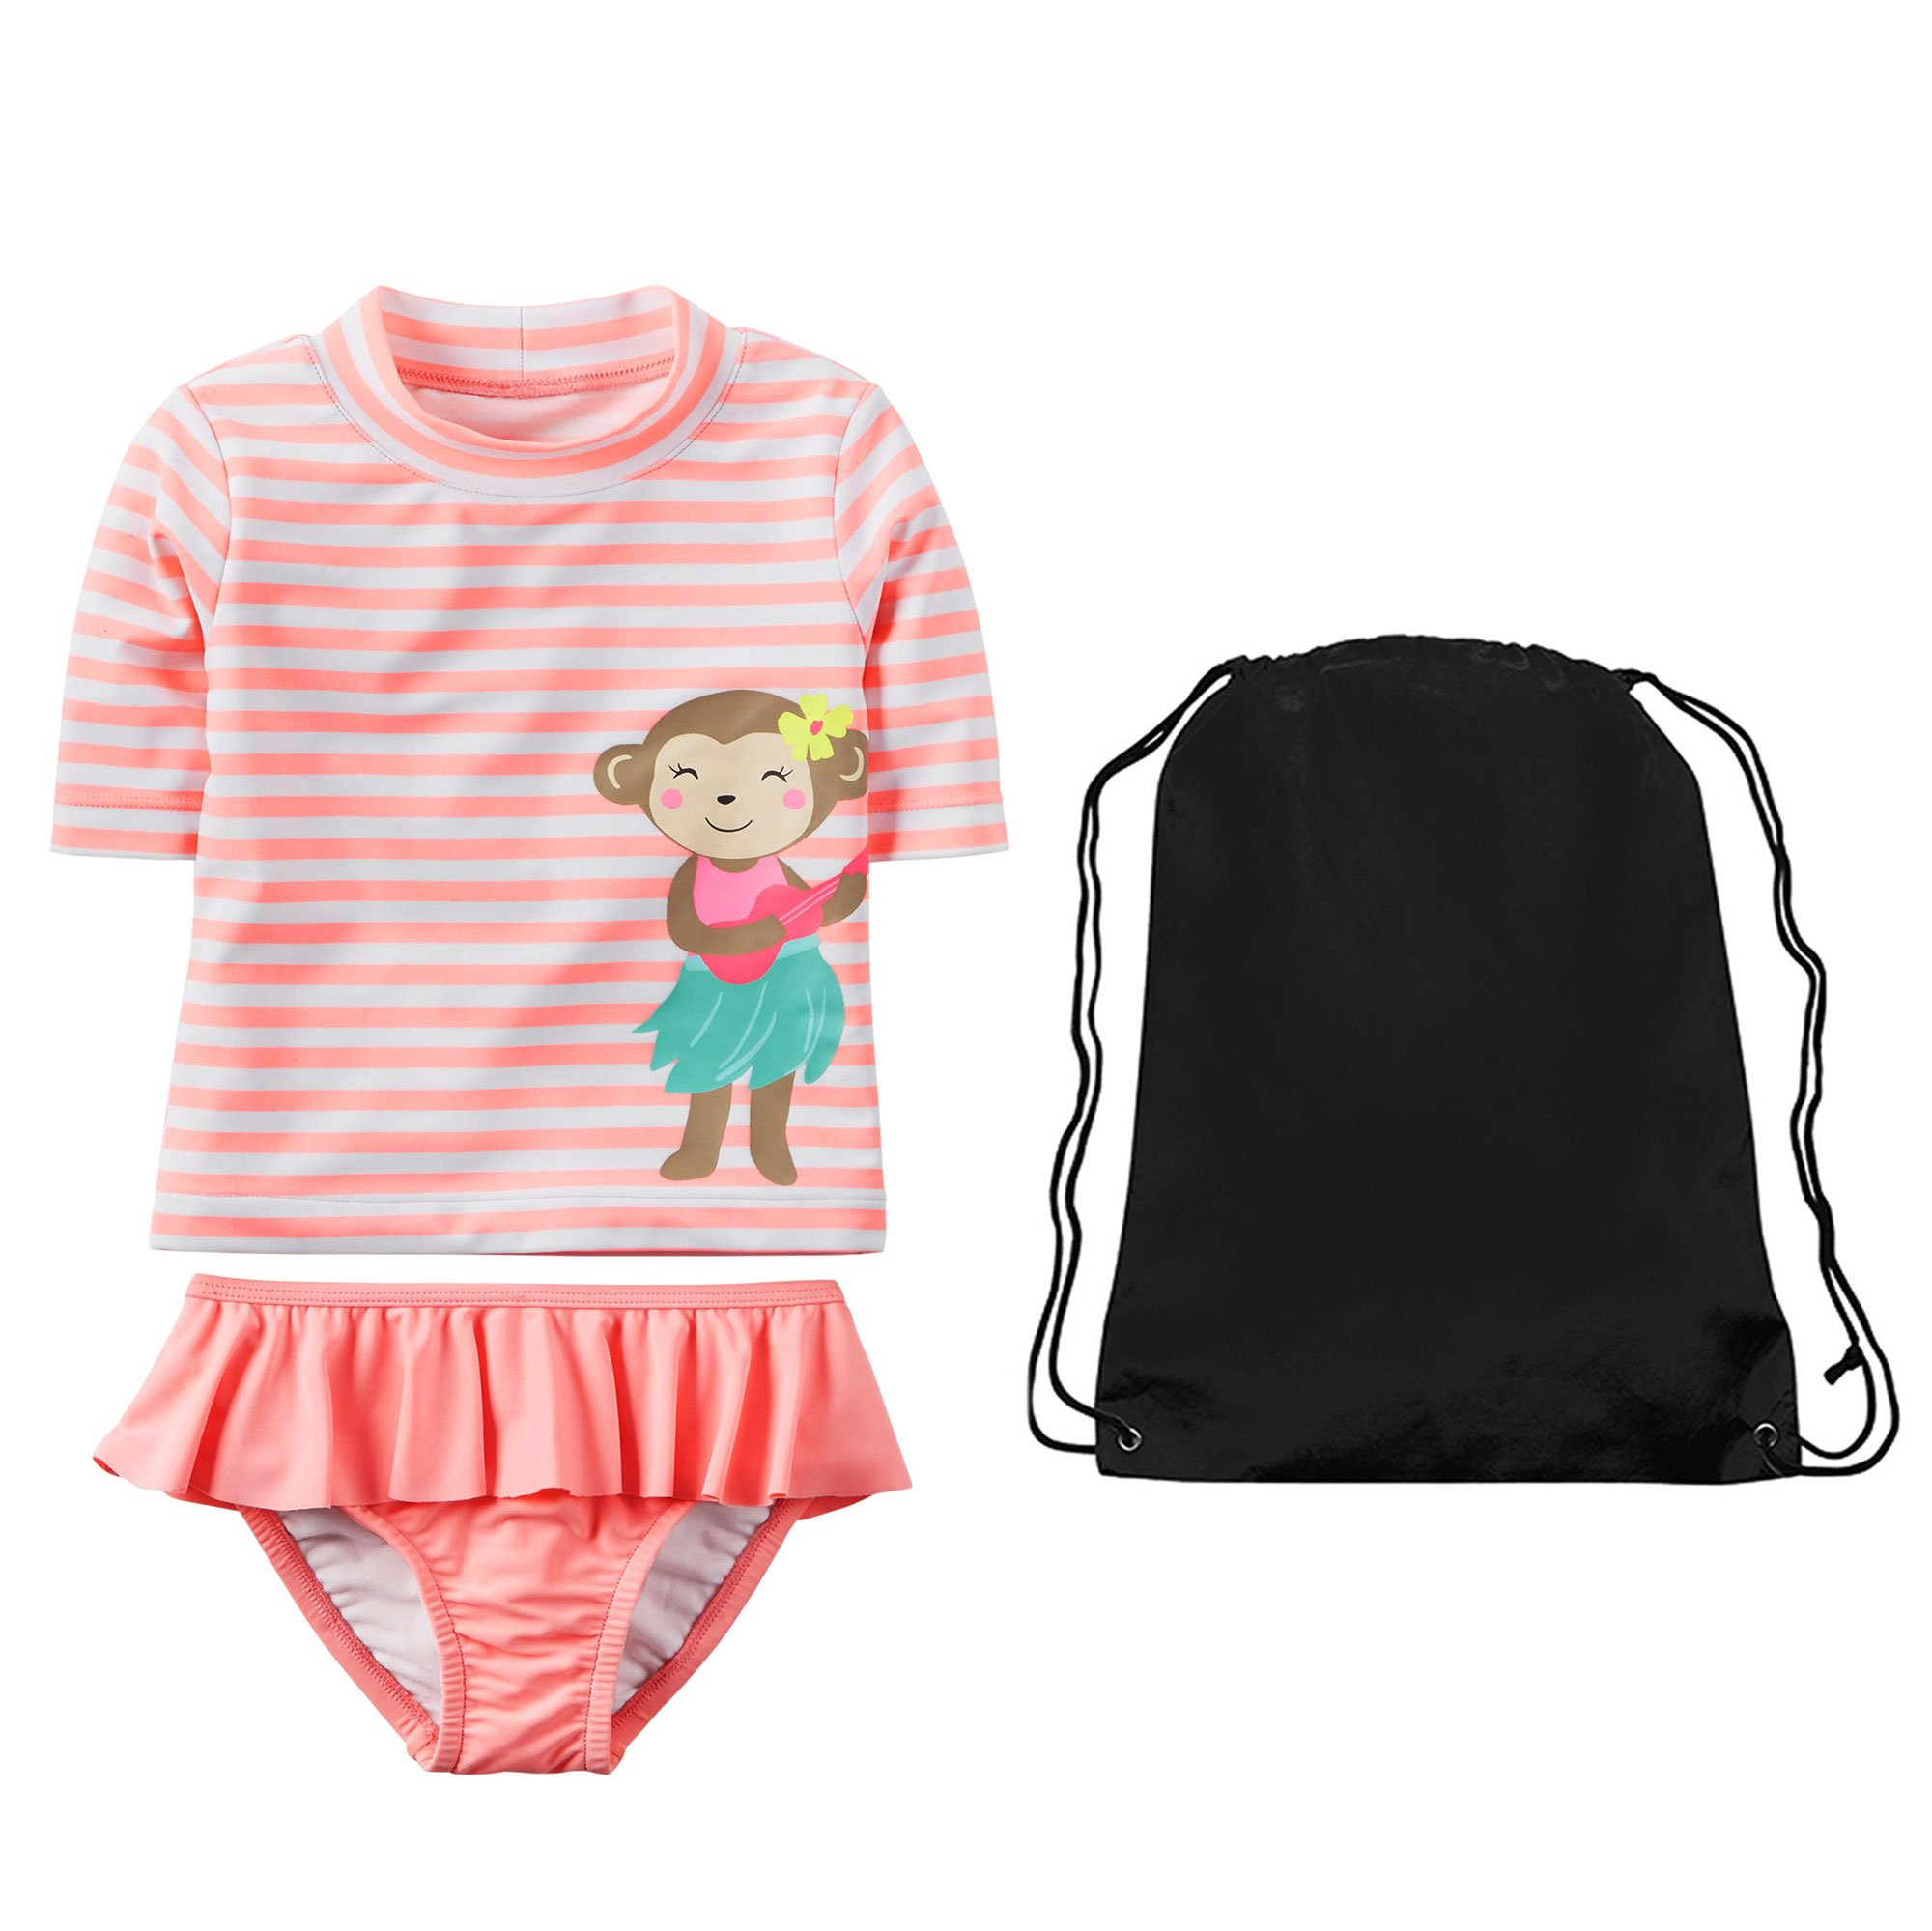 Carter's Girls Monkey Striped Rashguard Shirt Ruffle Skirt Bottom and Bag 6X by Carter's